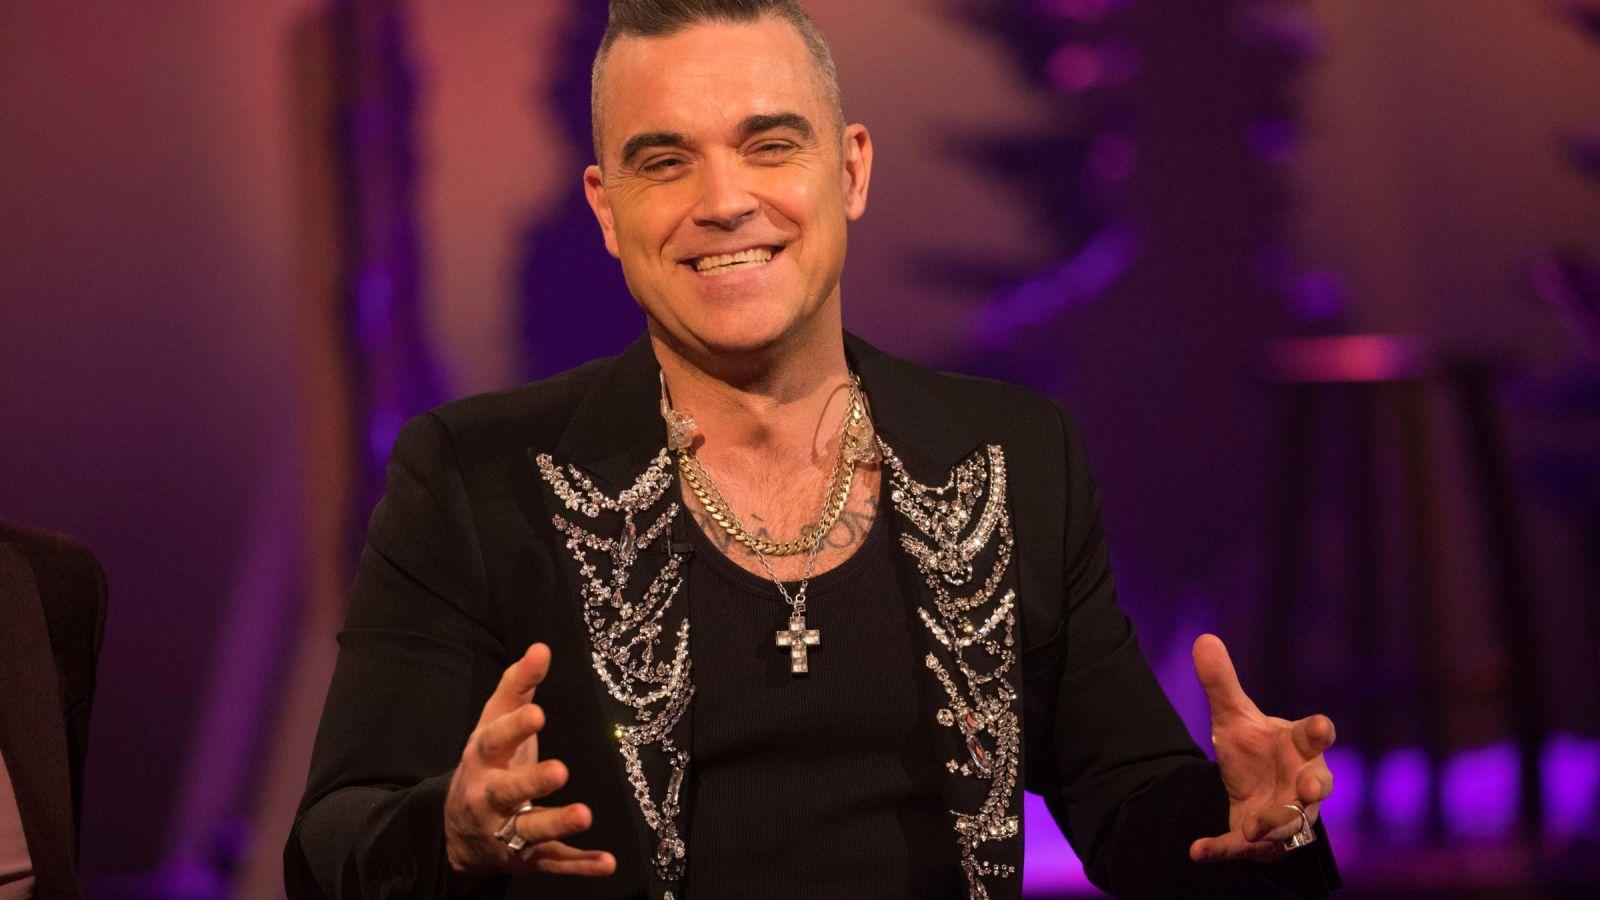 Robbie Williams: Η ζωή του σε ταινία – Από τους Take That στην ενηλικίωση